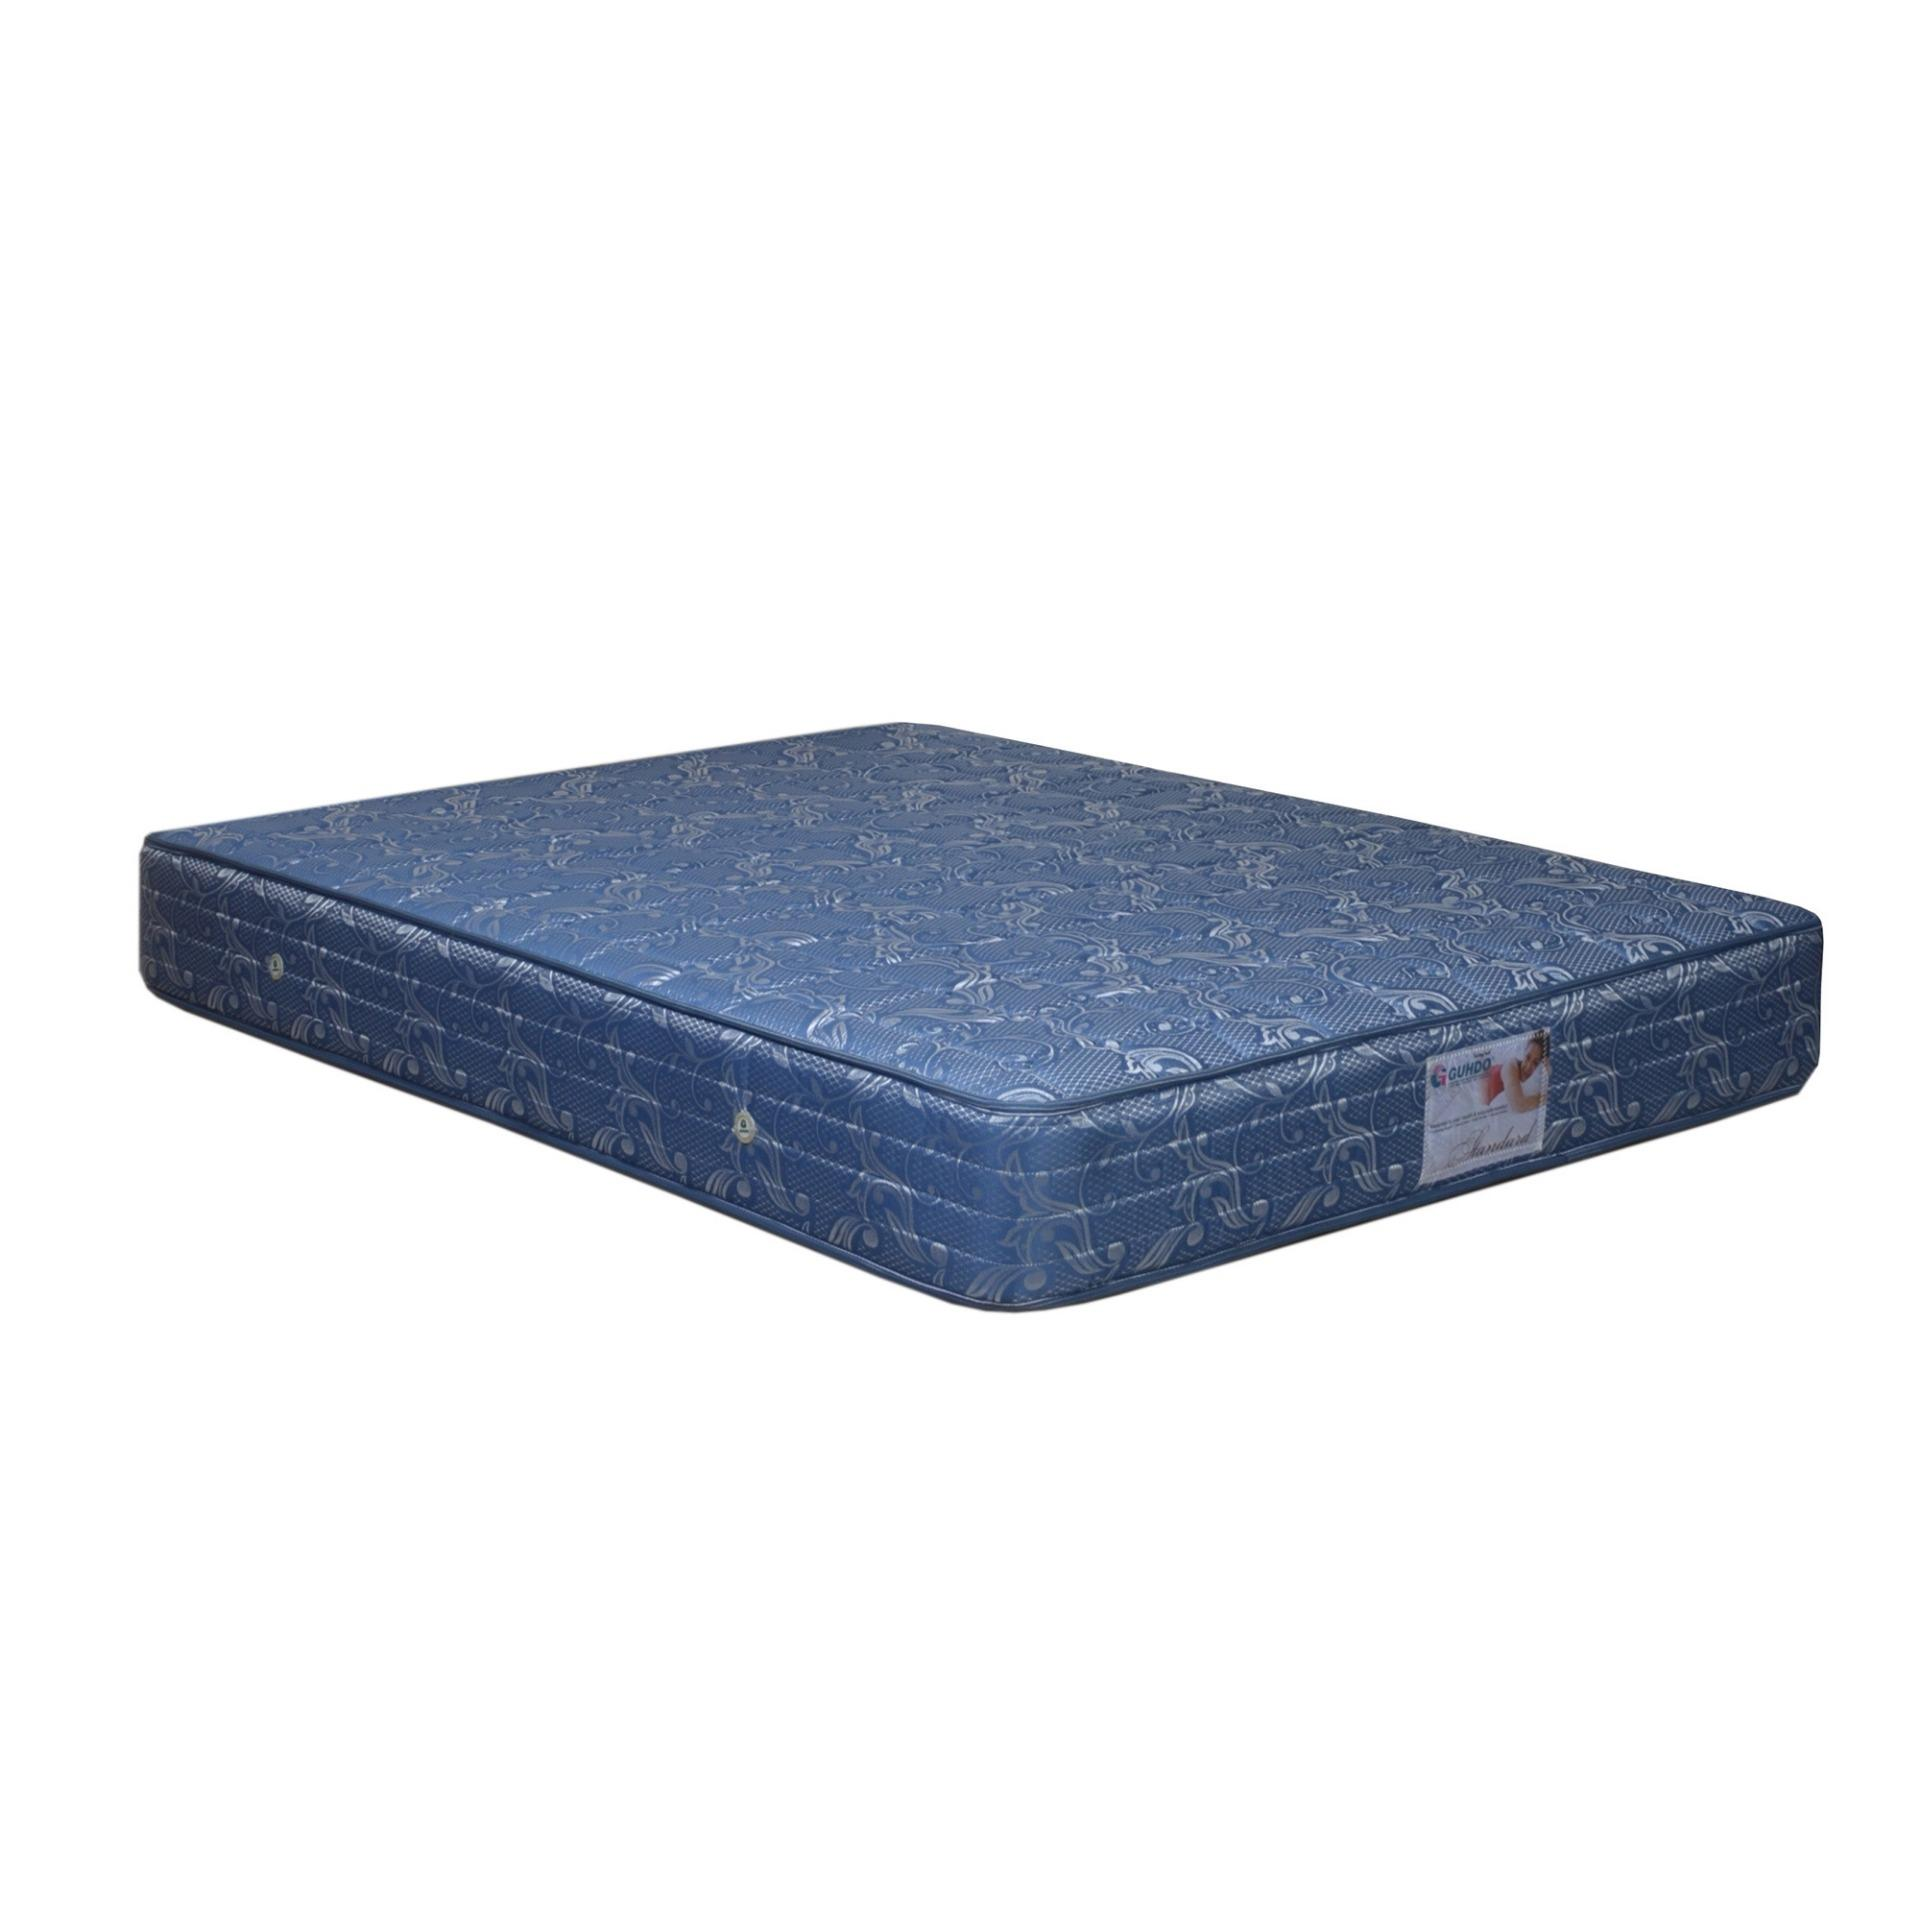 Jual Kasur Spring Bed Guhdo Mattress Matras Protector Pelindung 160 X 200 30 Putih Springbed New Prima Size Ketebalan 25 Cm Only Biru